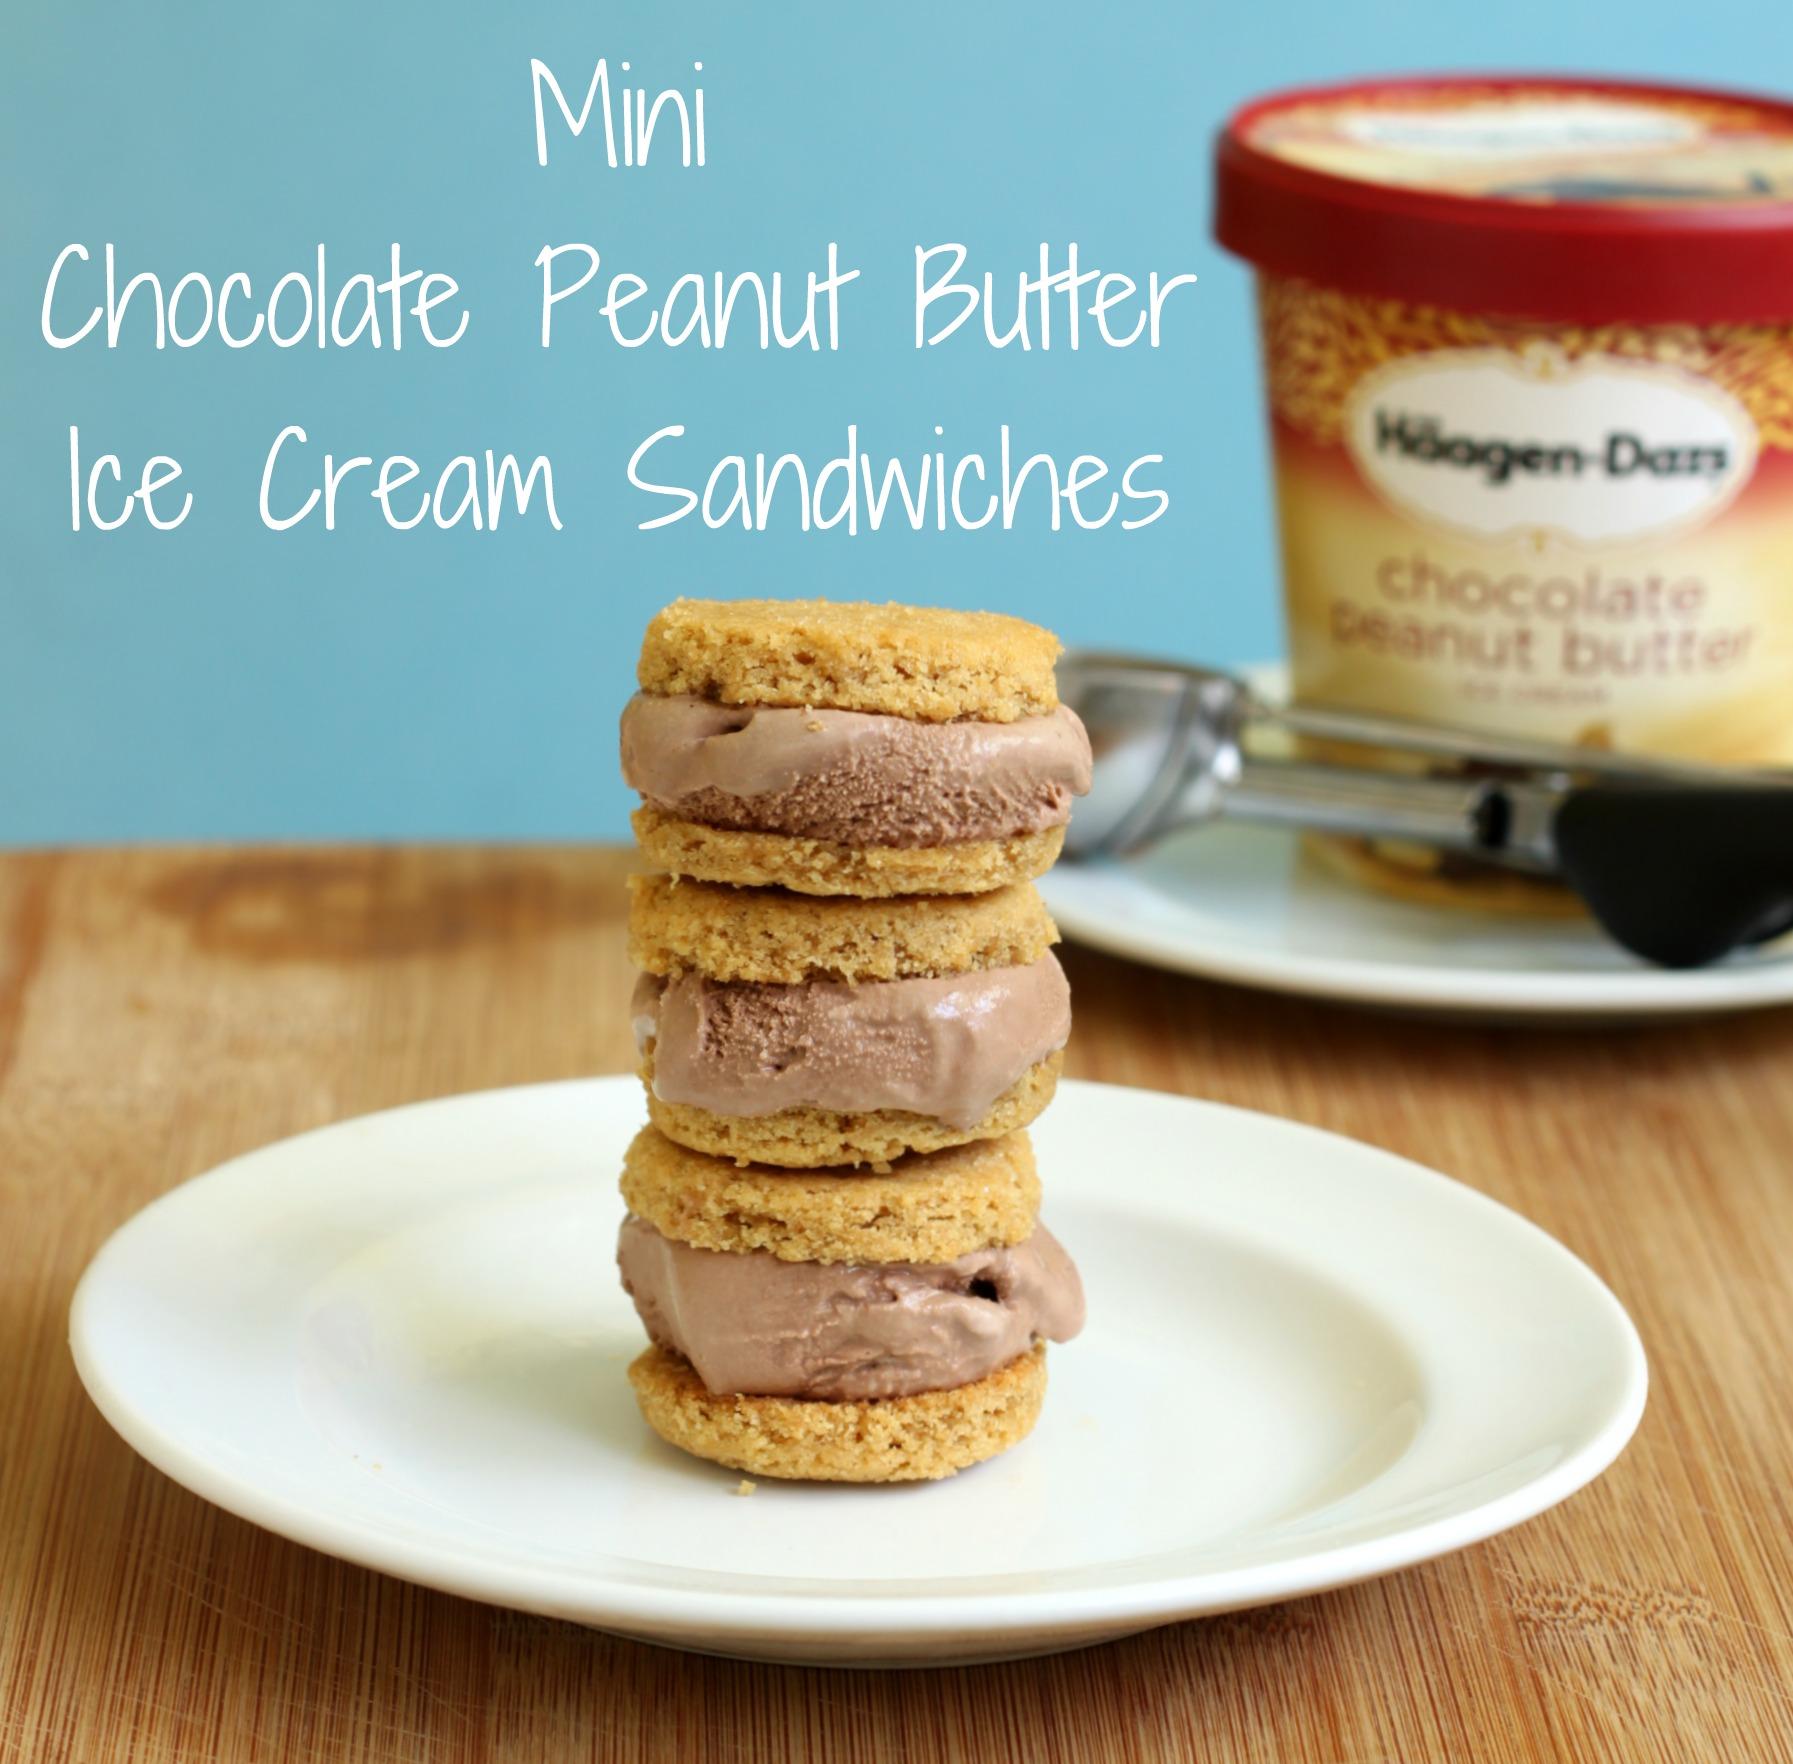 Mini peanut butter chocolate ice cream sandwiches